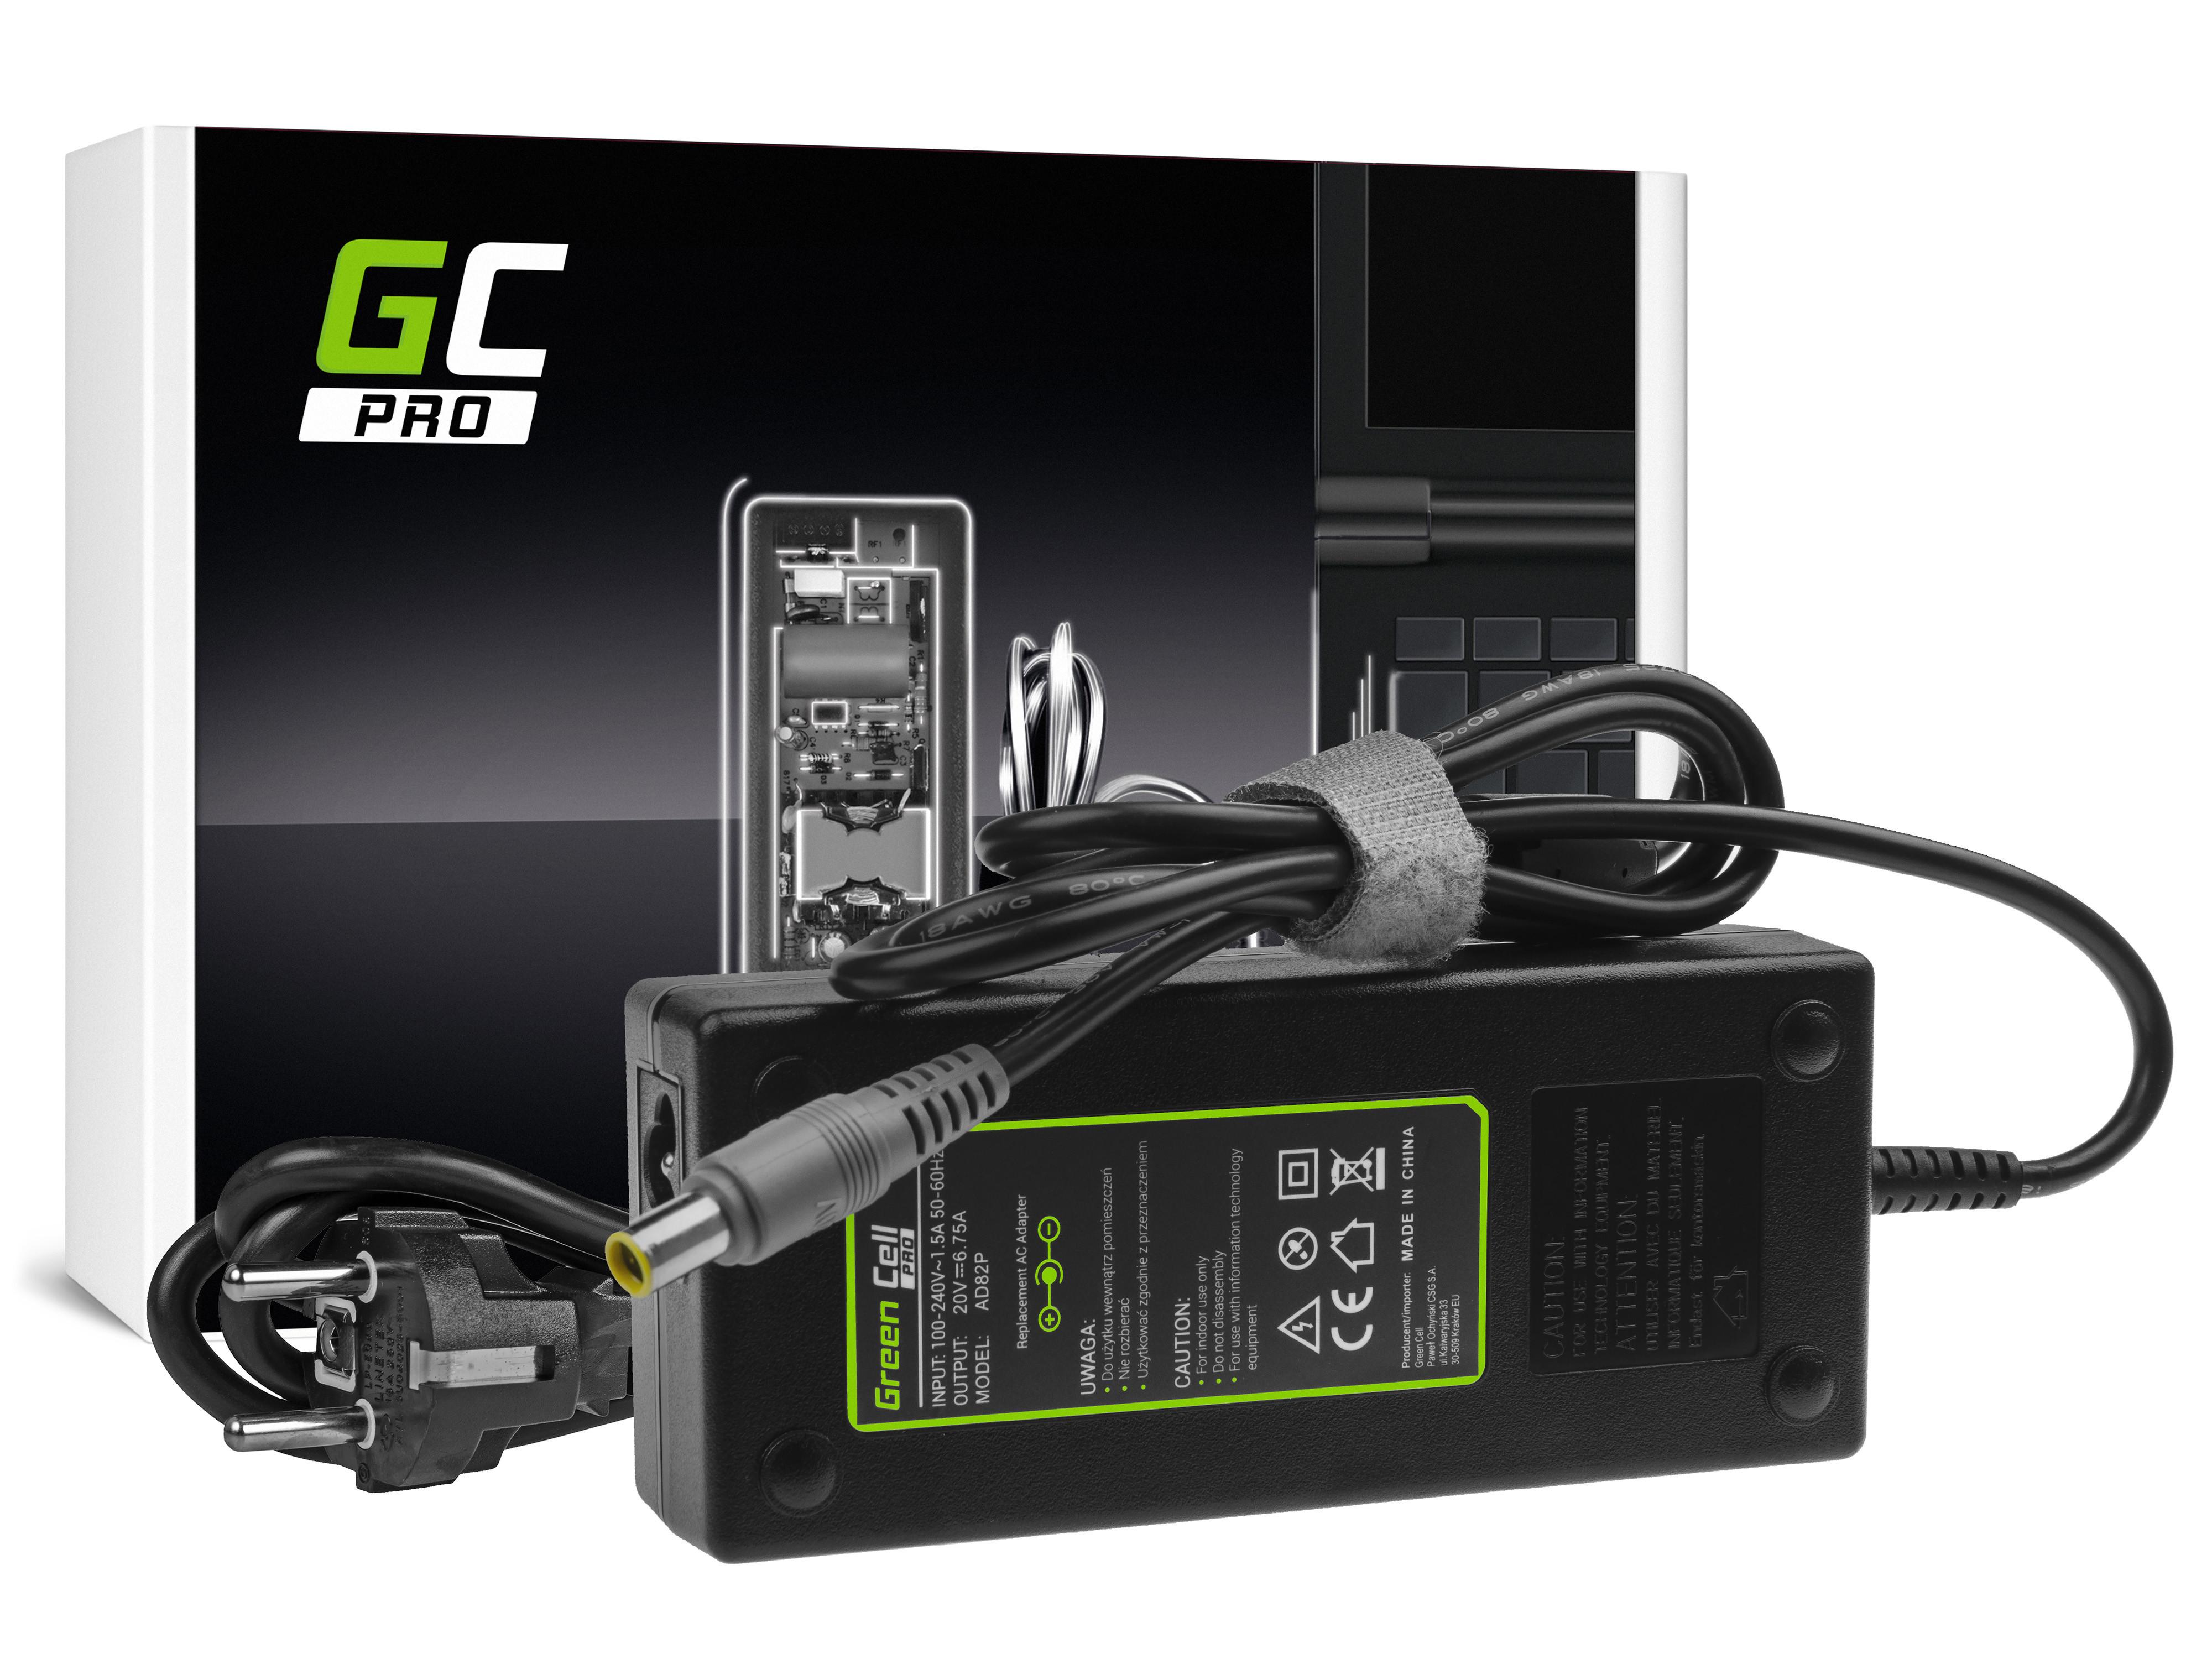 Green Cell AD82P Nabíječka Adaptér pro Lenovo Thinkpad T520 T520i T530 T530i W520 W530 20V 6.75A   135W   konektor 7.9-5.5mm